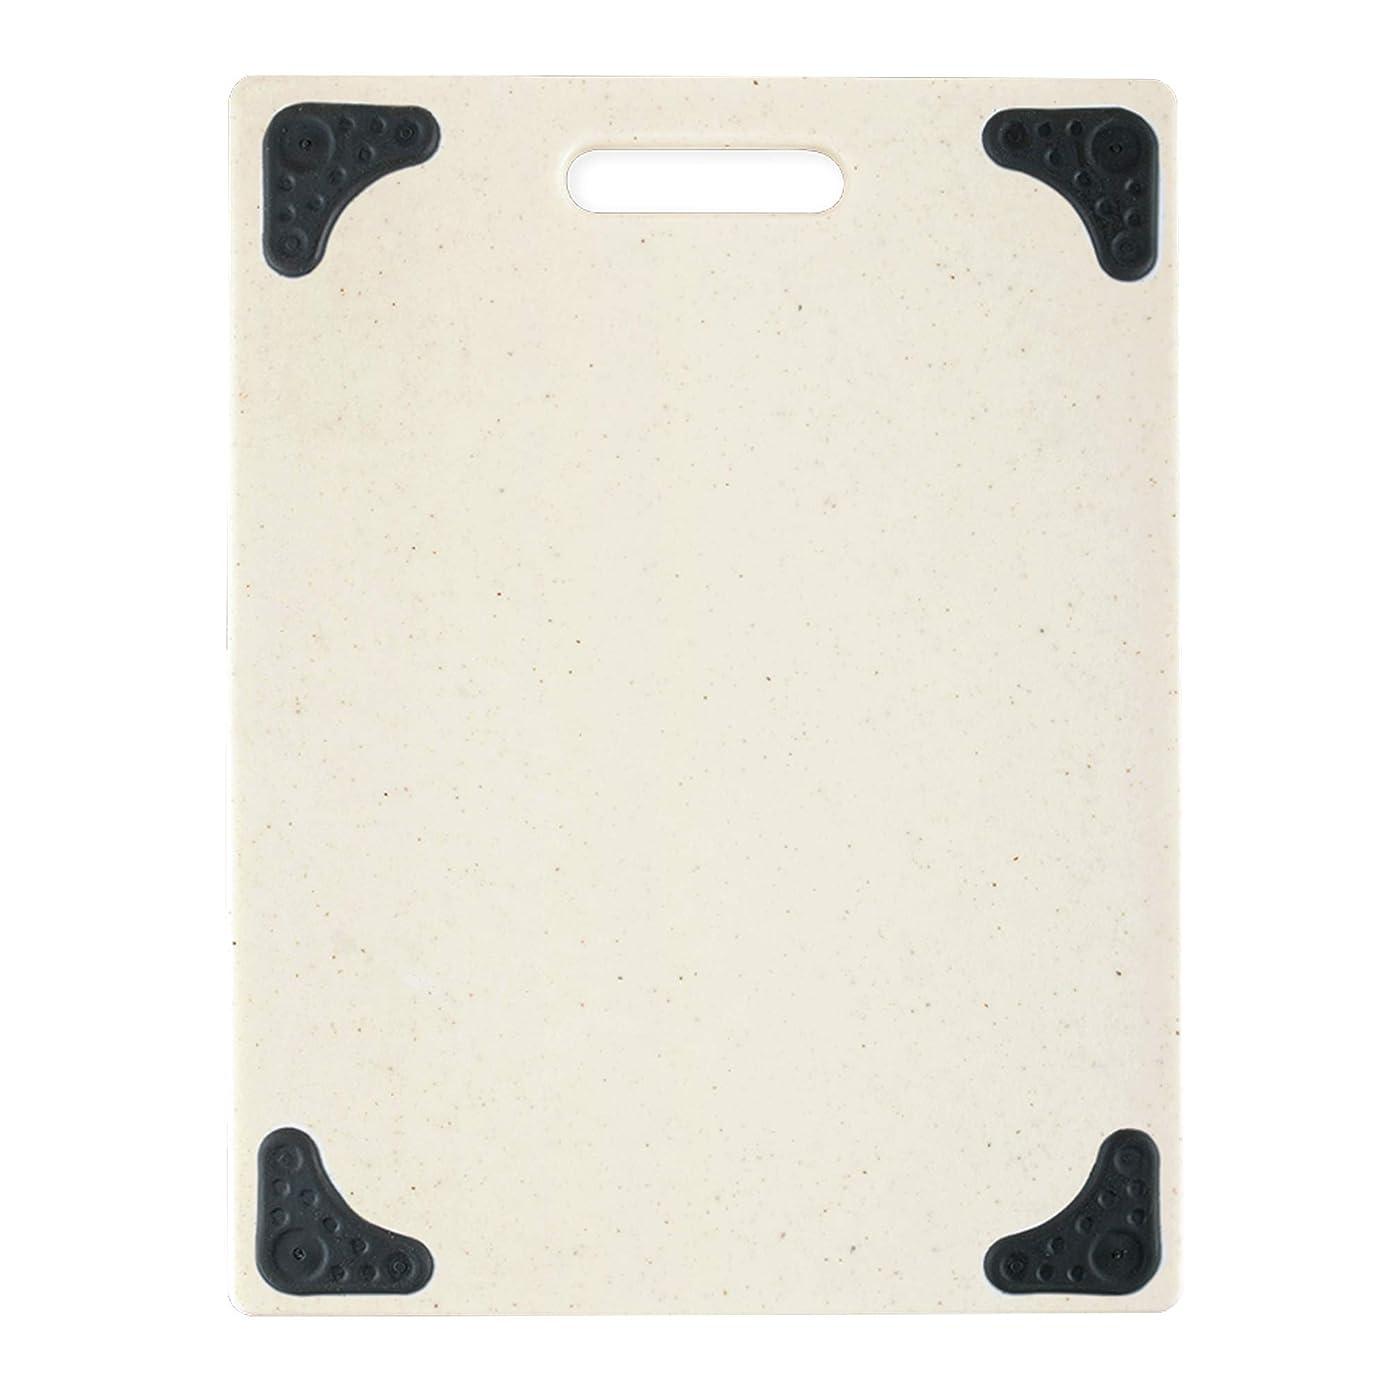 Dexas 451-TF51 Grippboard Non-Slip Feet Cutting Board, 11 by 14.5 inch Oatmeal Granite